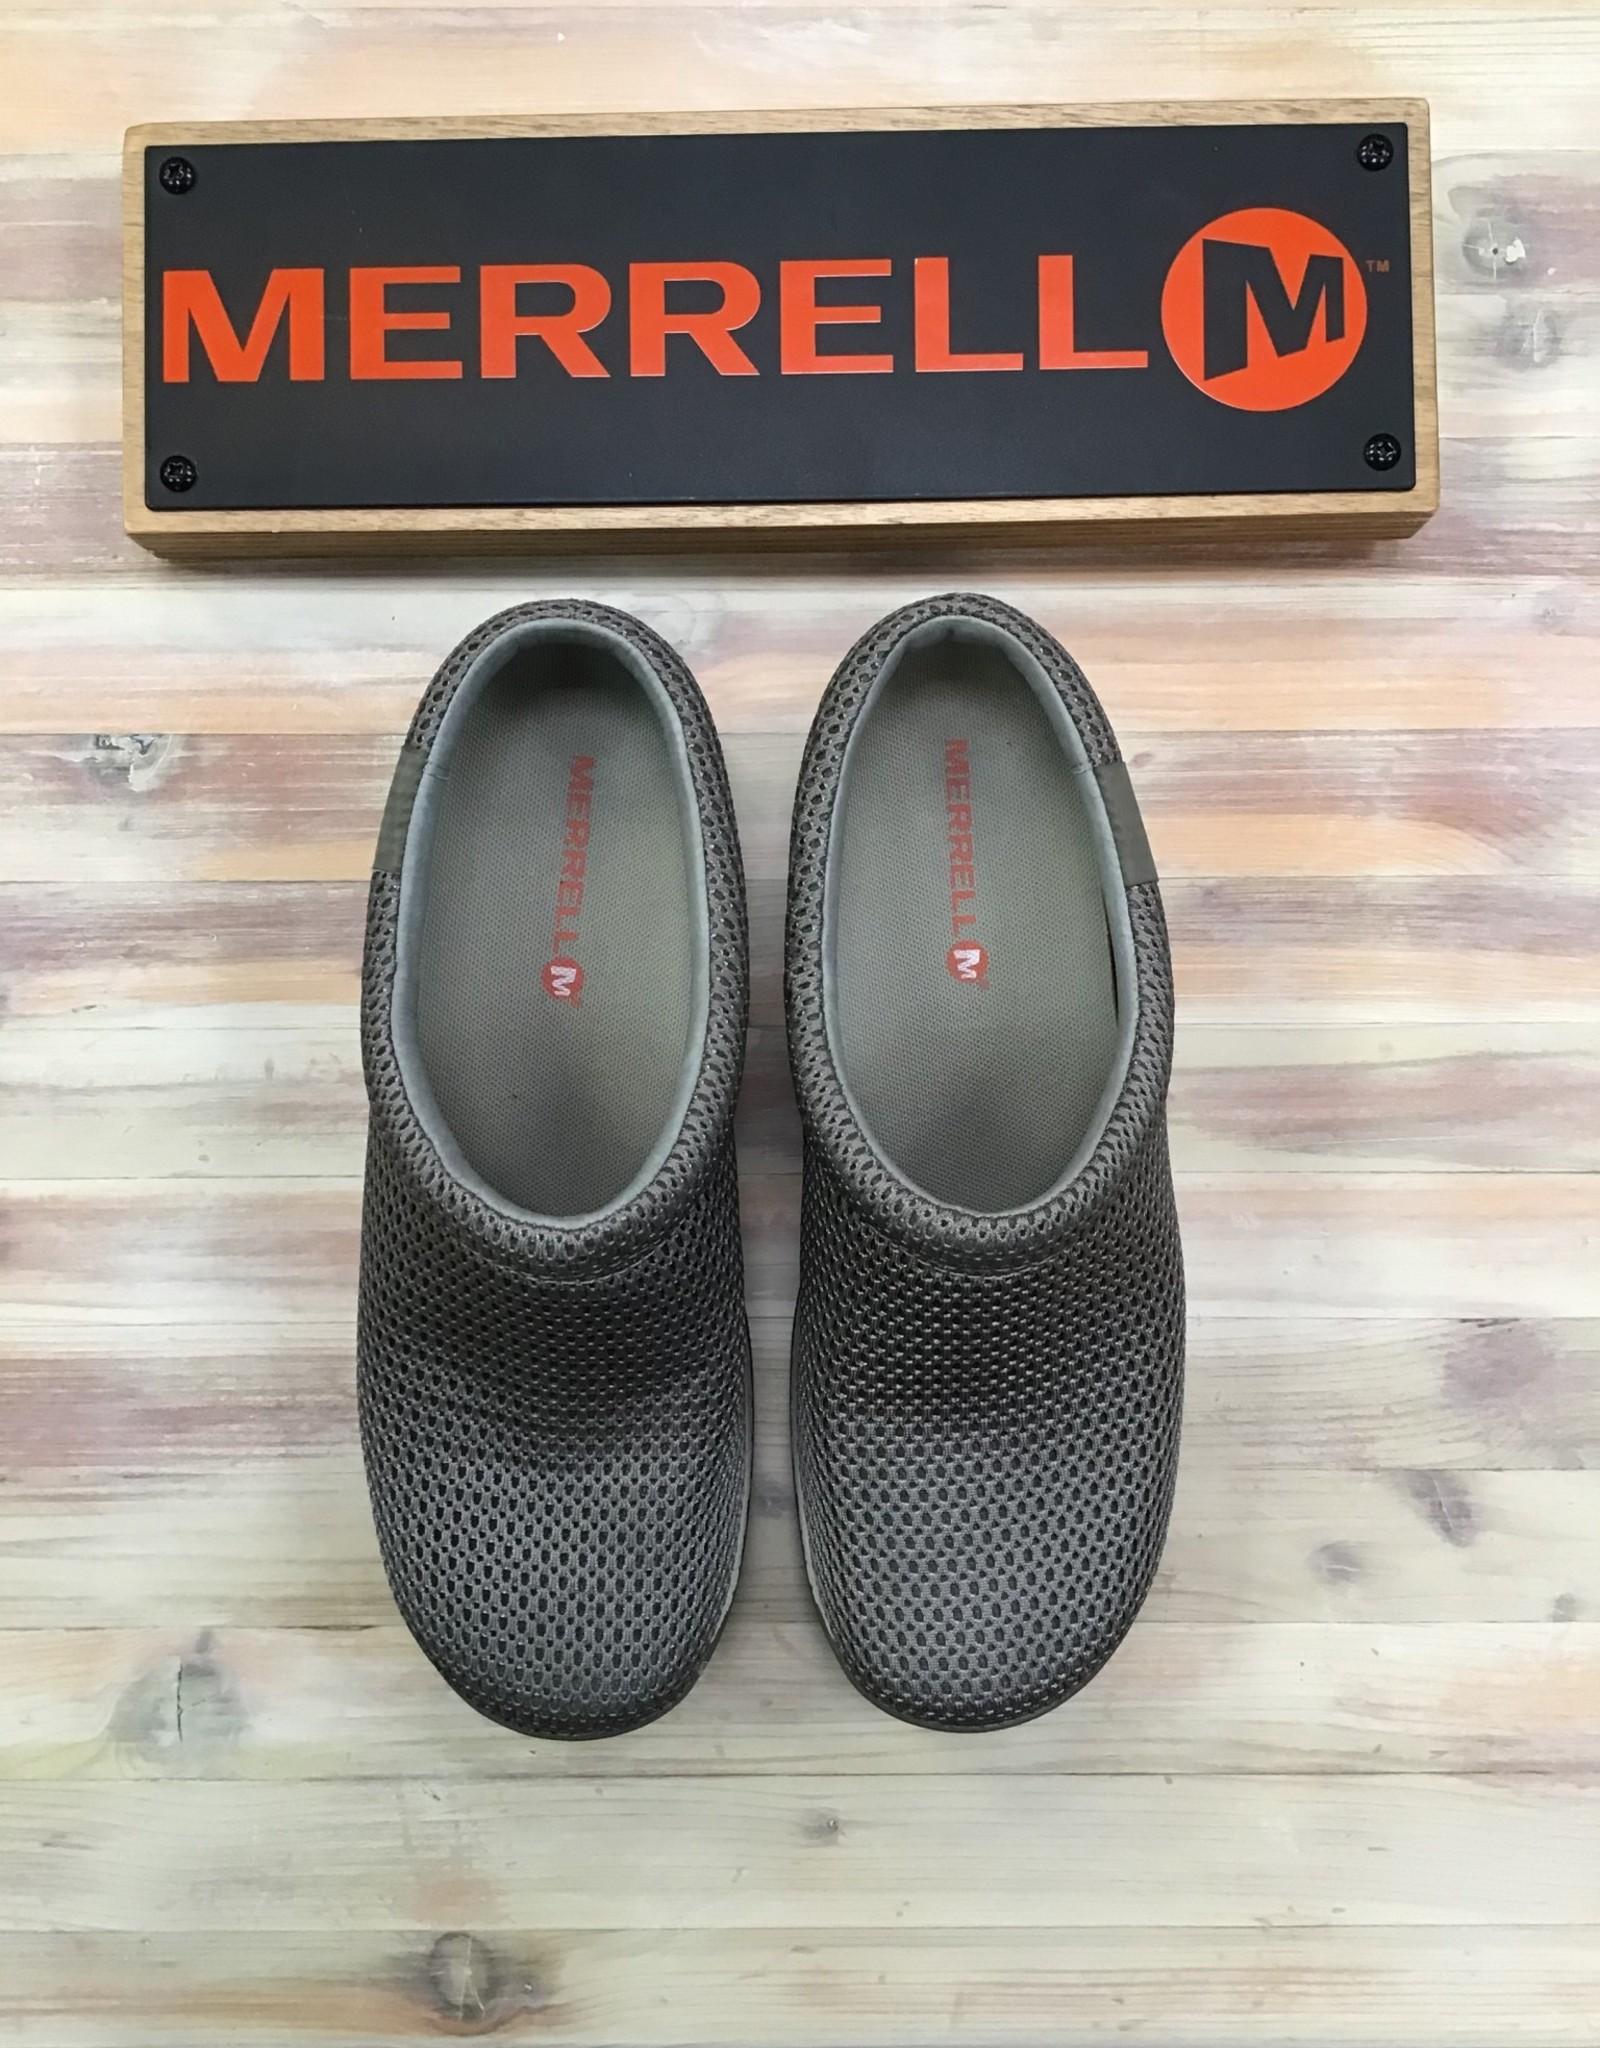 Merrell Merrell Encore Q2 Breeze Ladies'